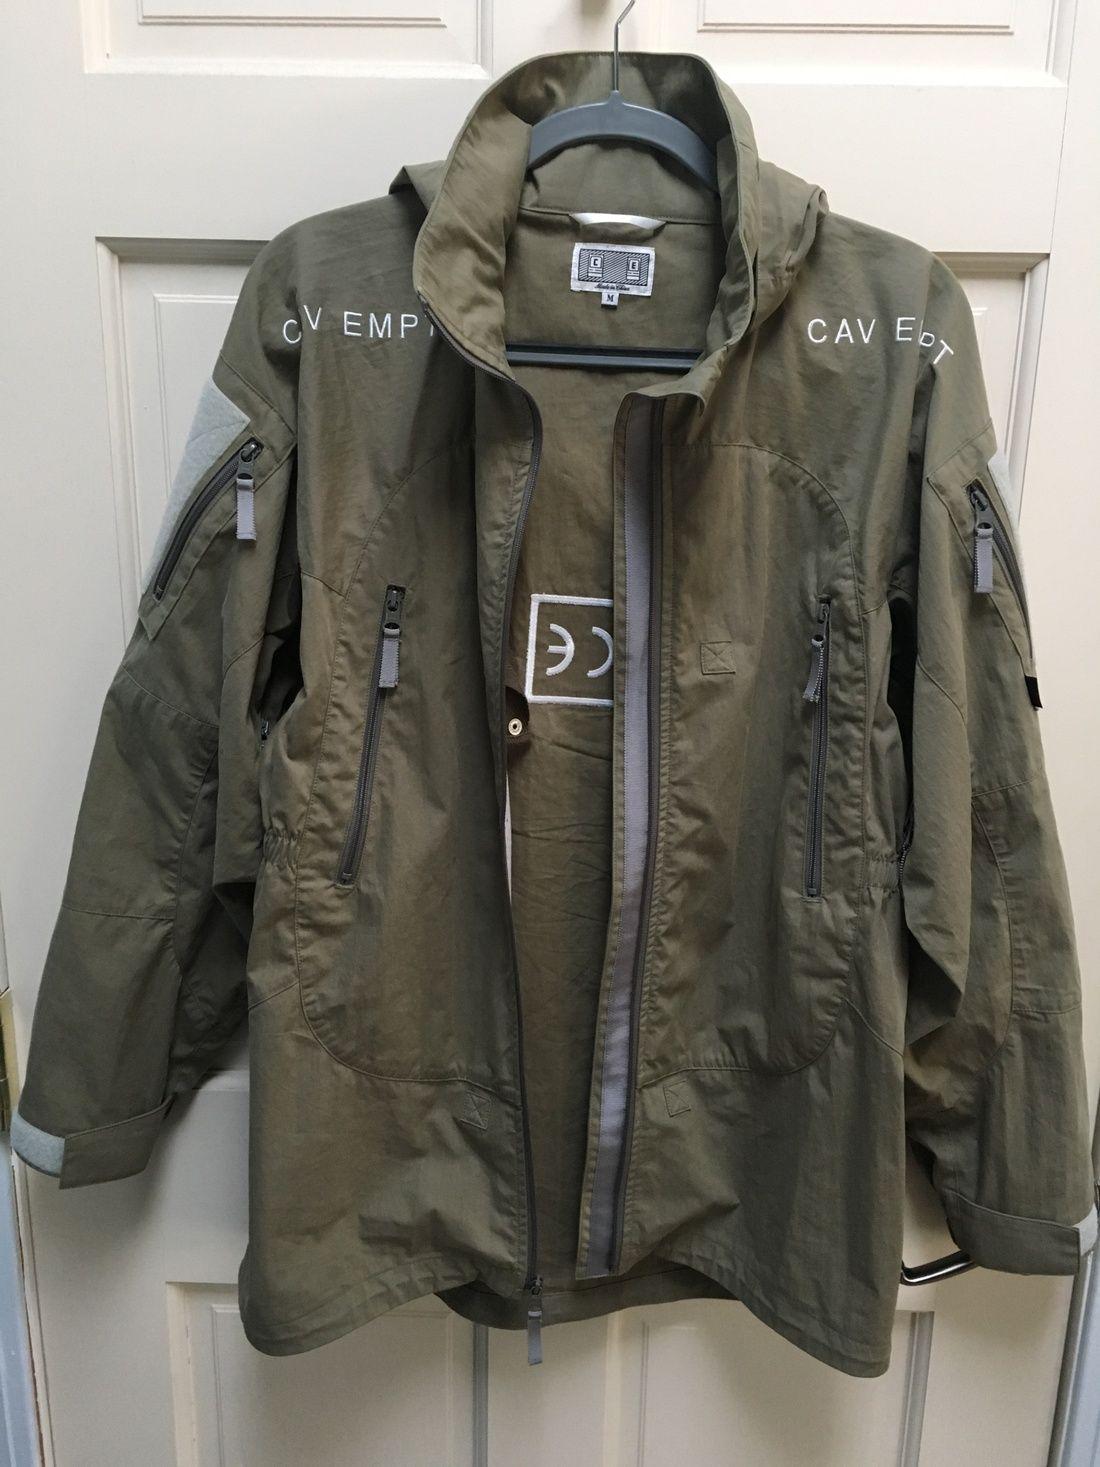 2542ad5b4d3b Cav Empt Mil Grey Liner Jacket Size M  600 - Grailed